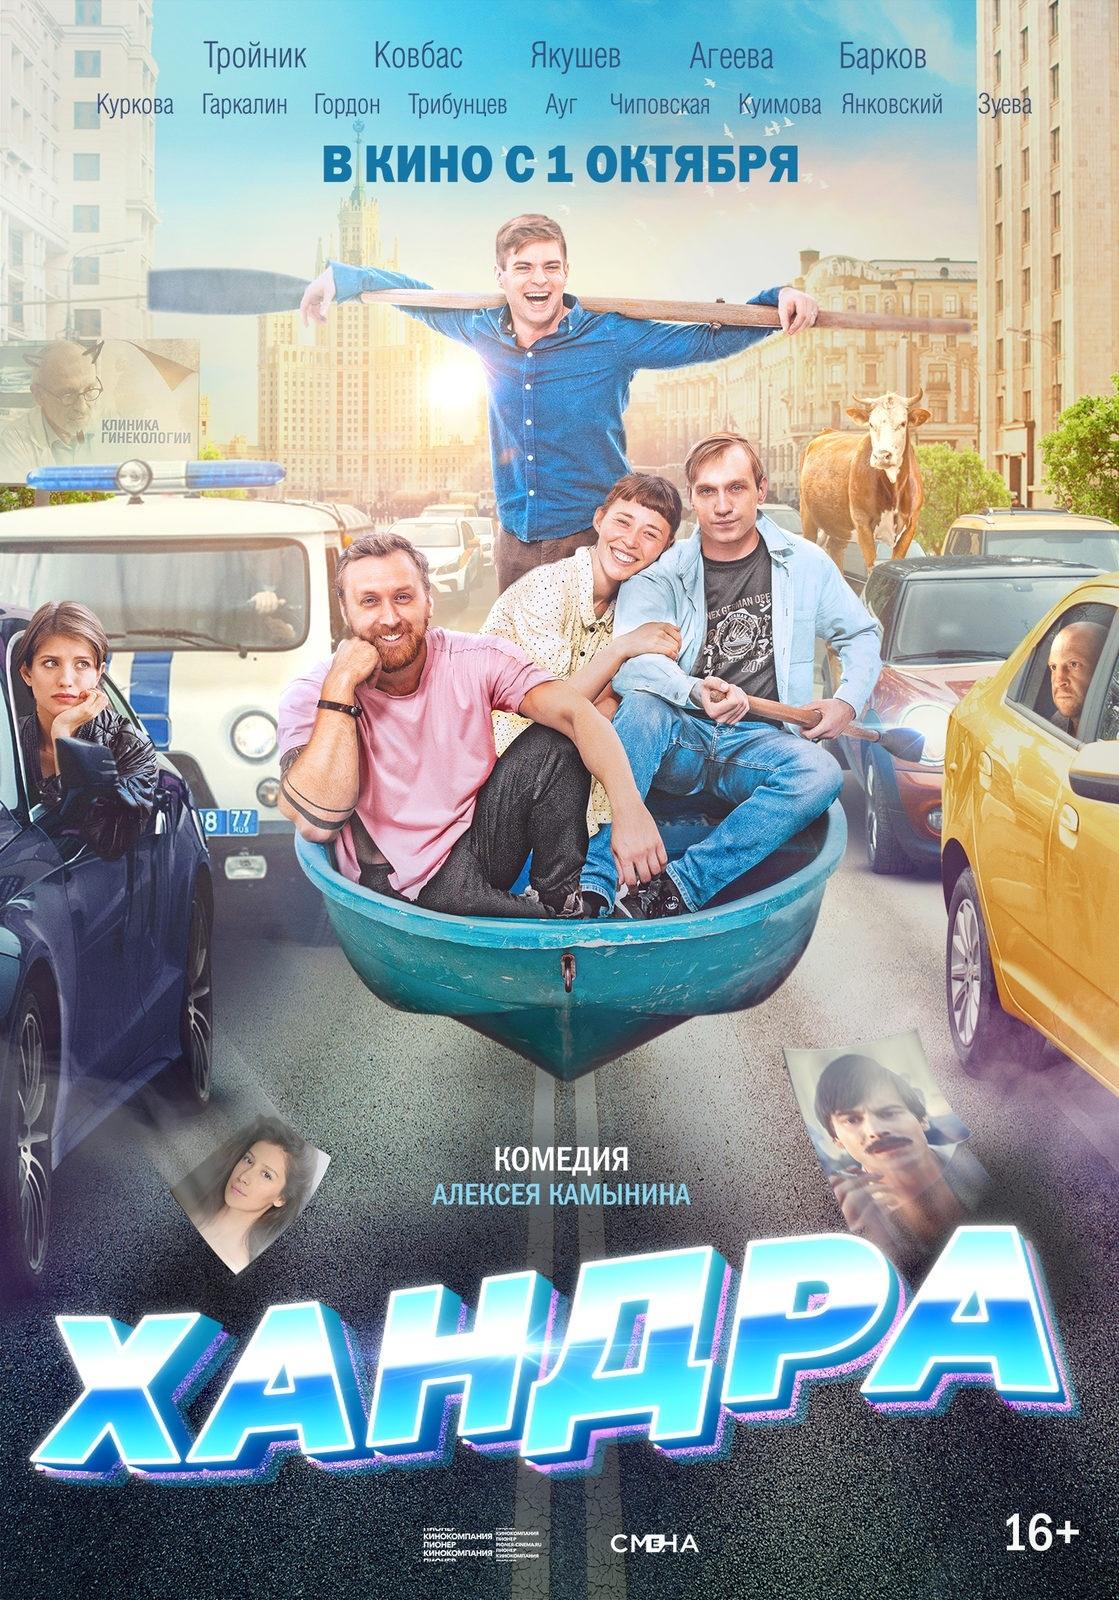 Комедия «Xaндpa» (2020) HD